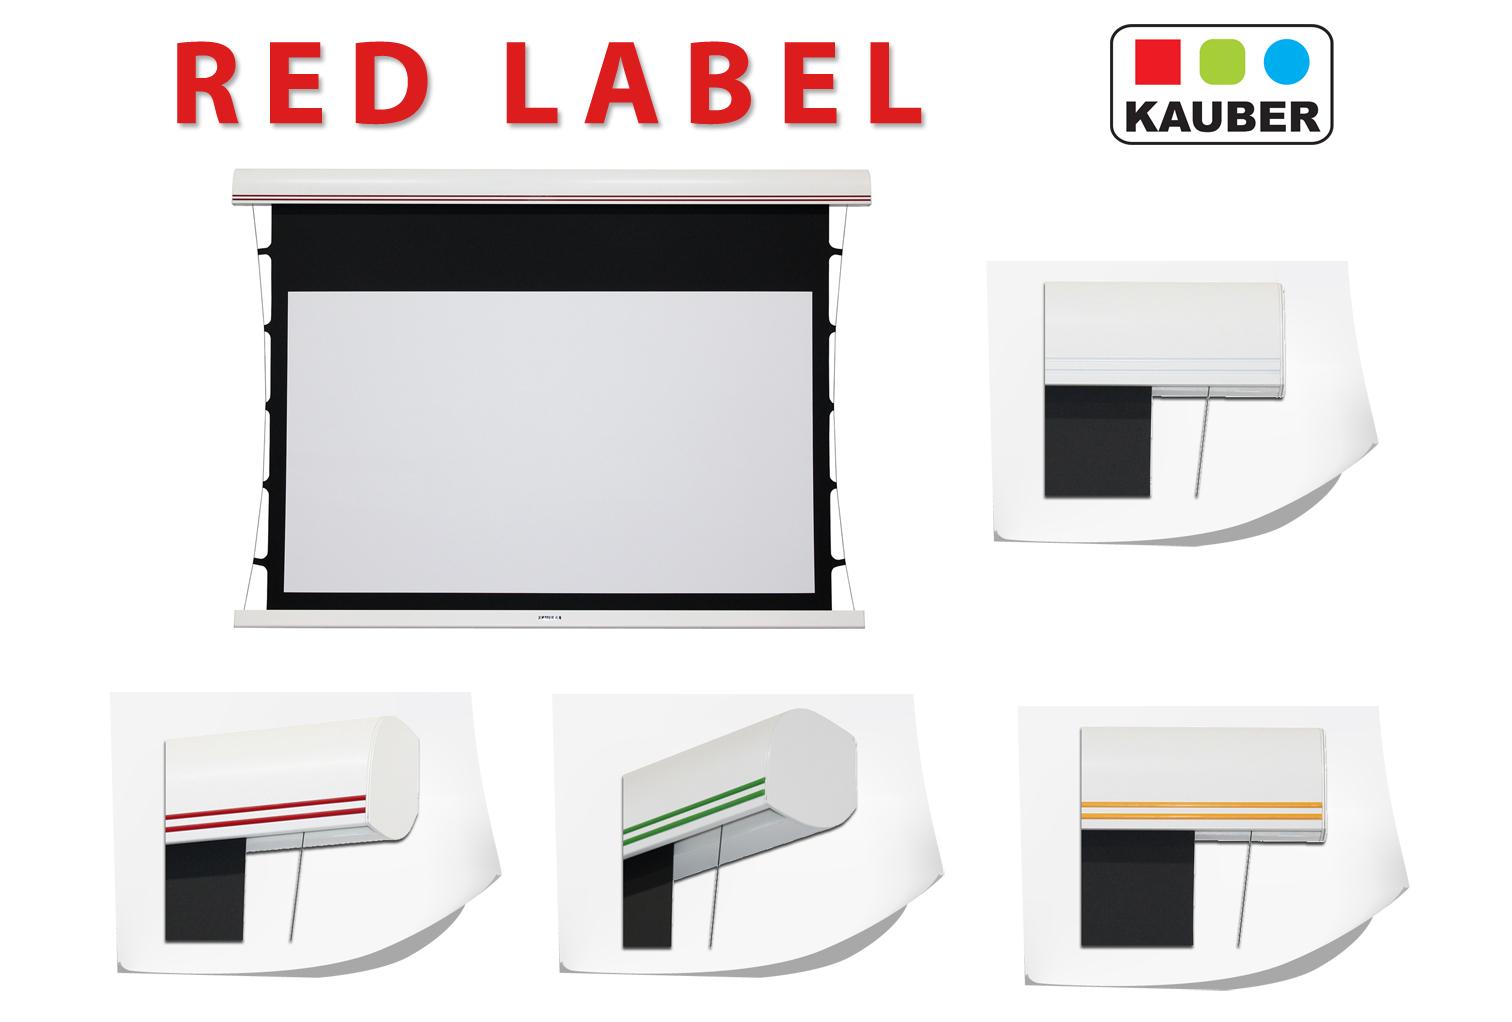 kauber motorleinwand red label tension g nstig online kaufen. Black Bedroom Furniture Sets. Home Design Ideas